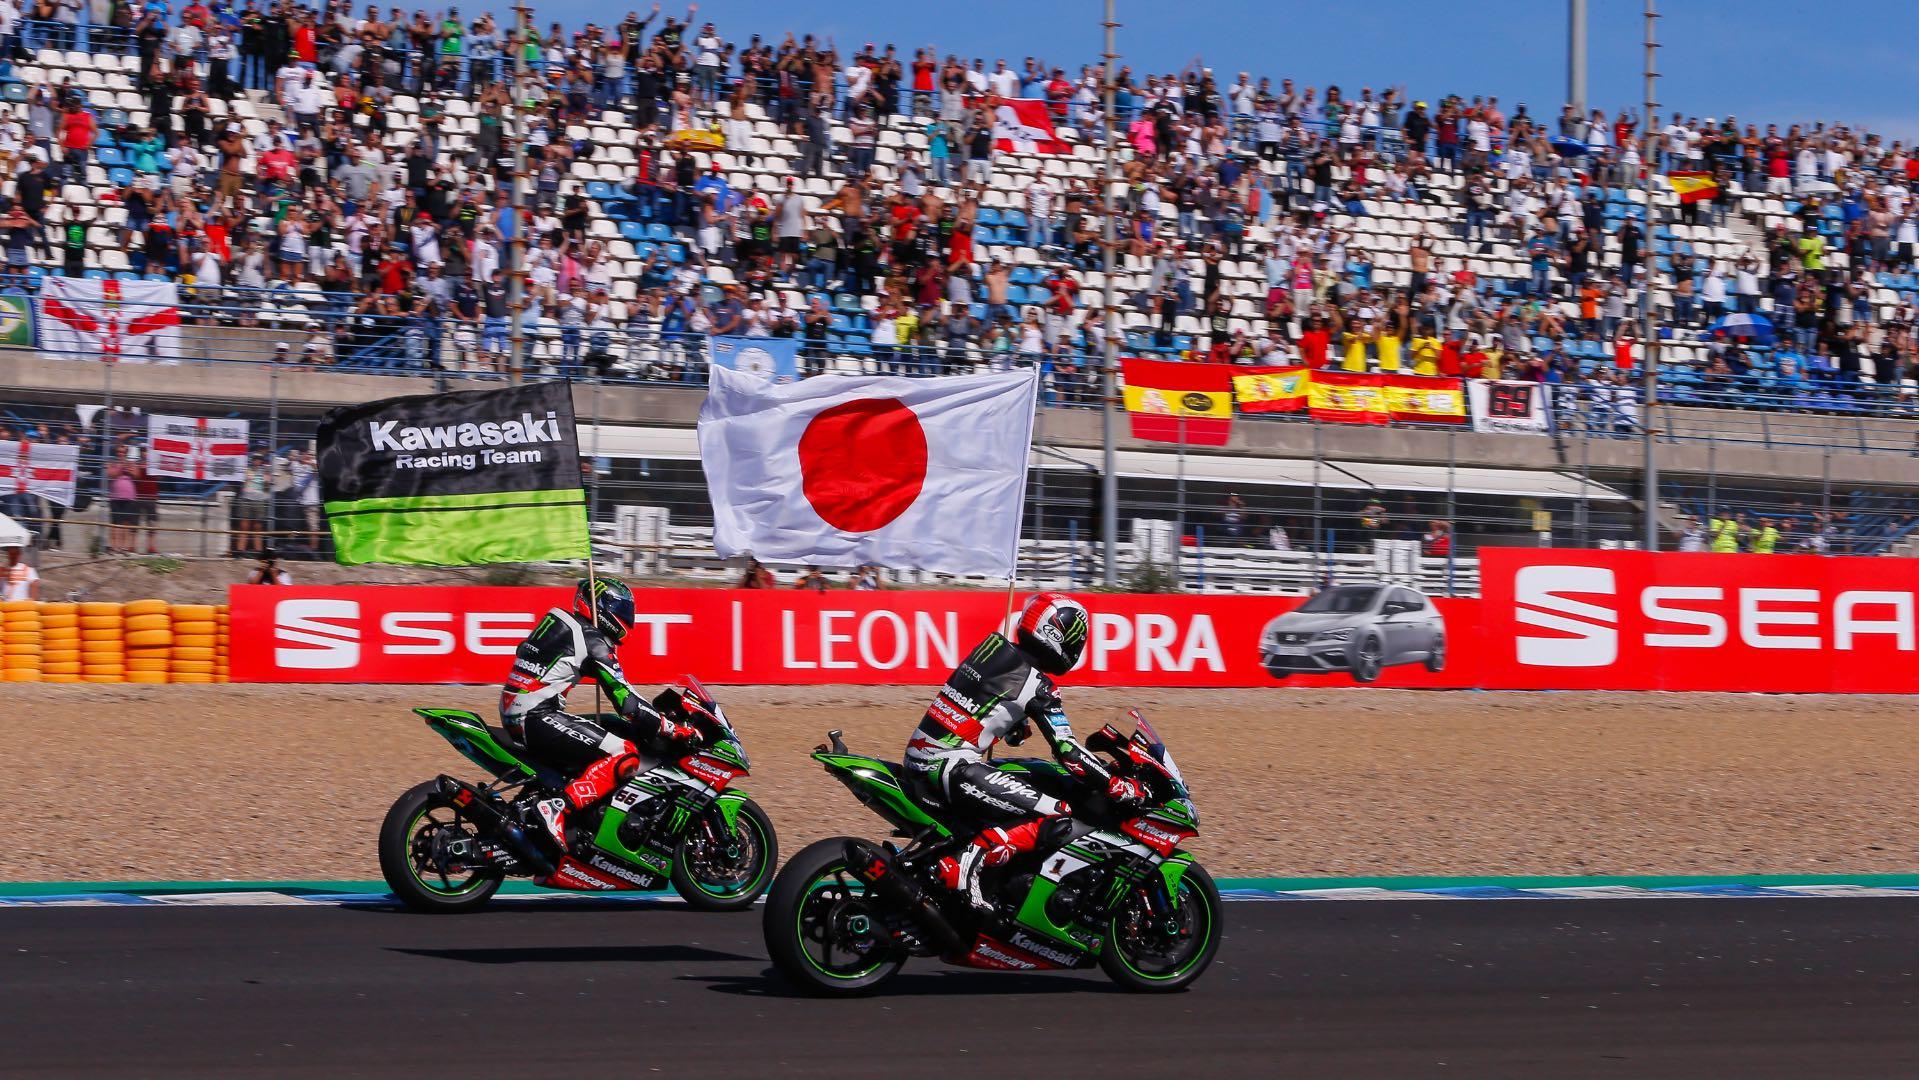 2017 Jerez World Superbike Results Kawasaki manufacturer's title